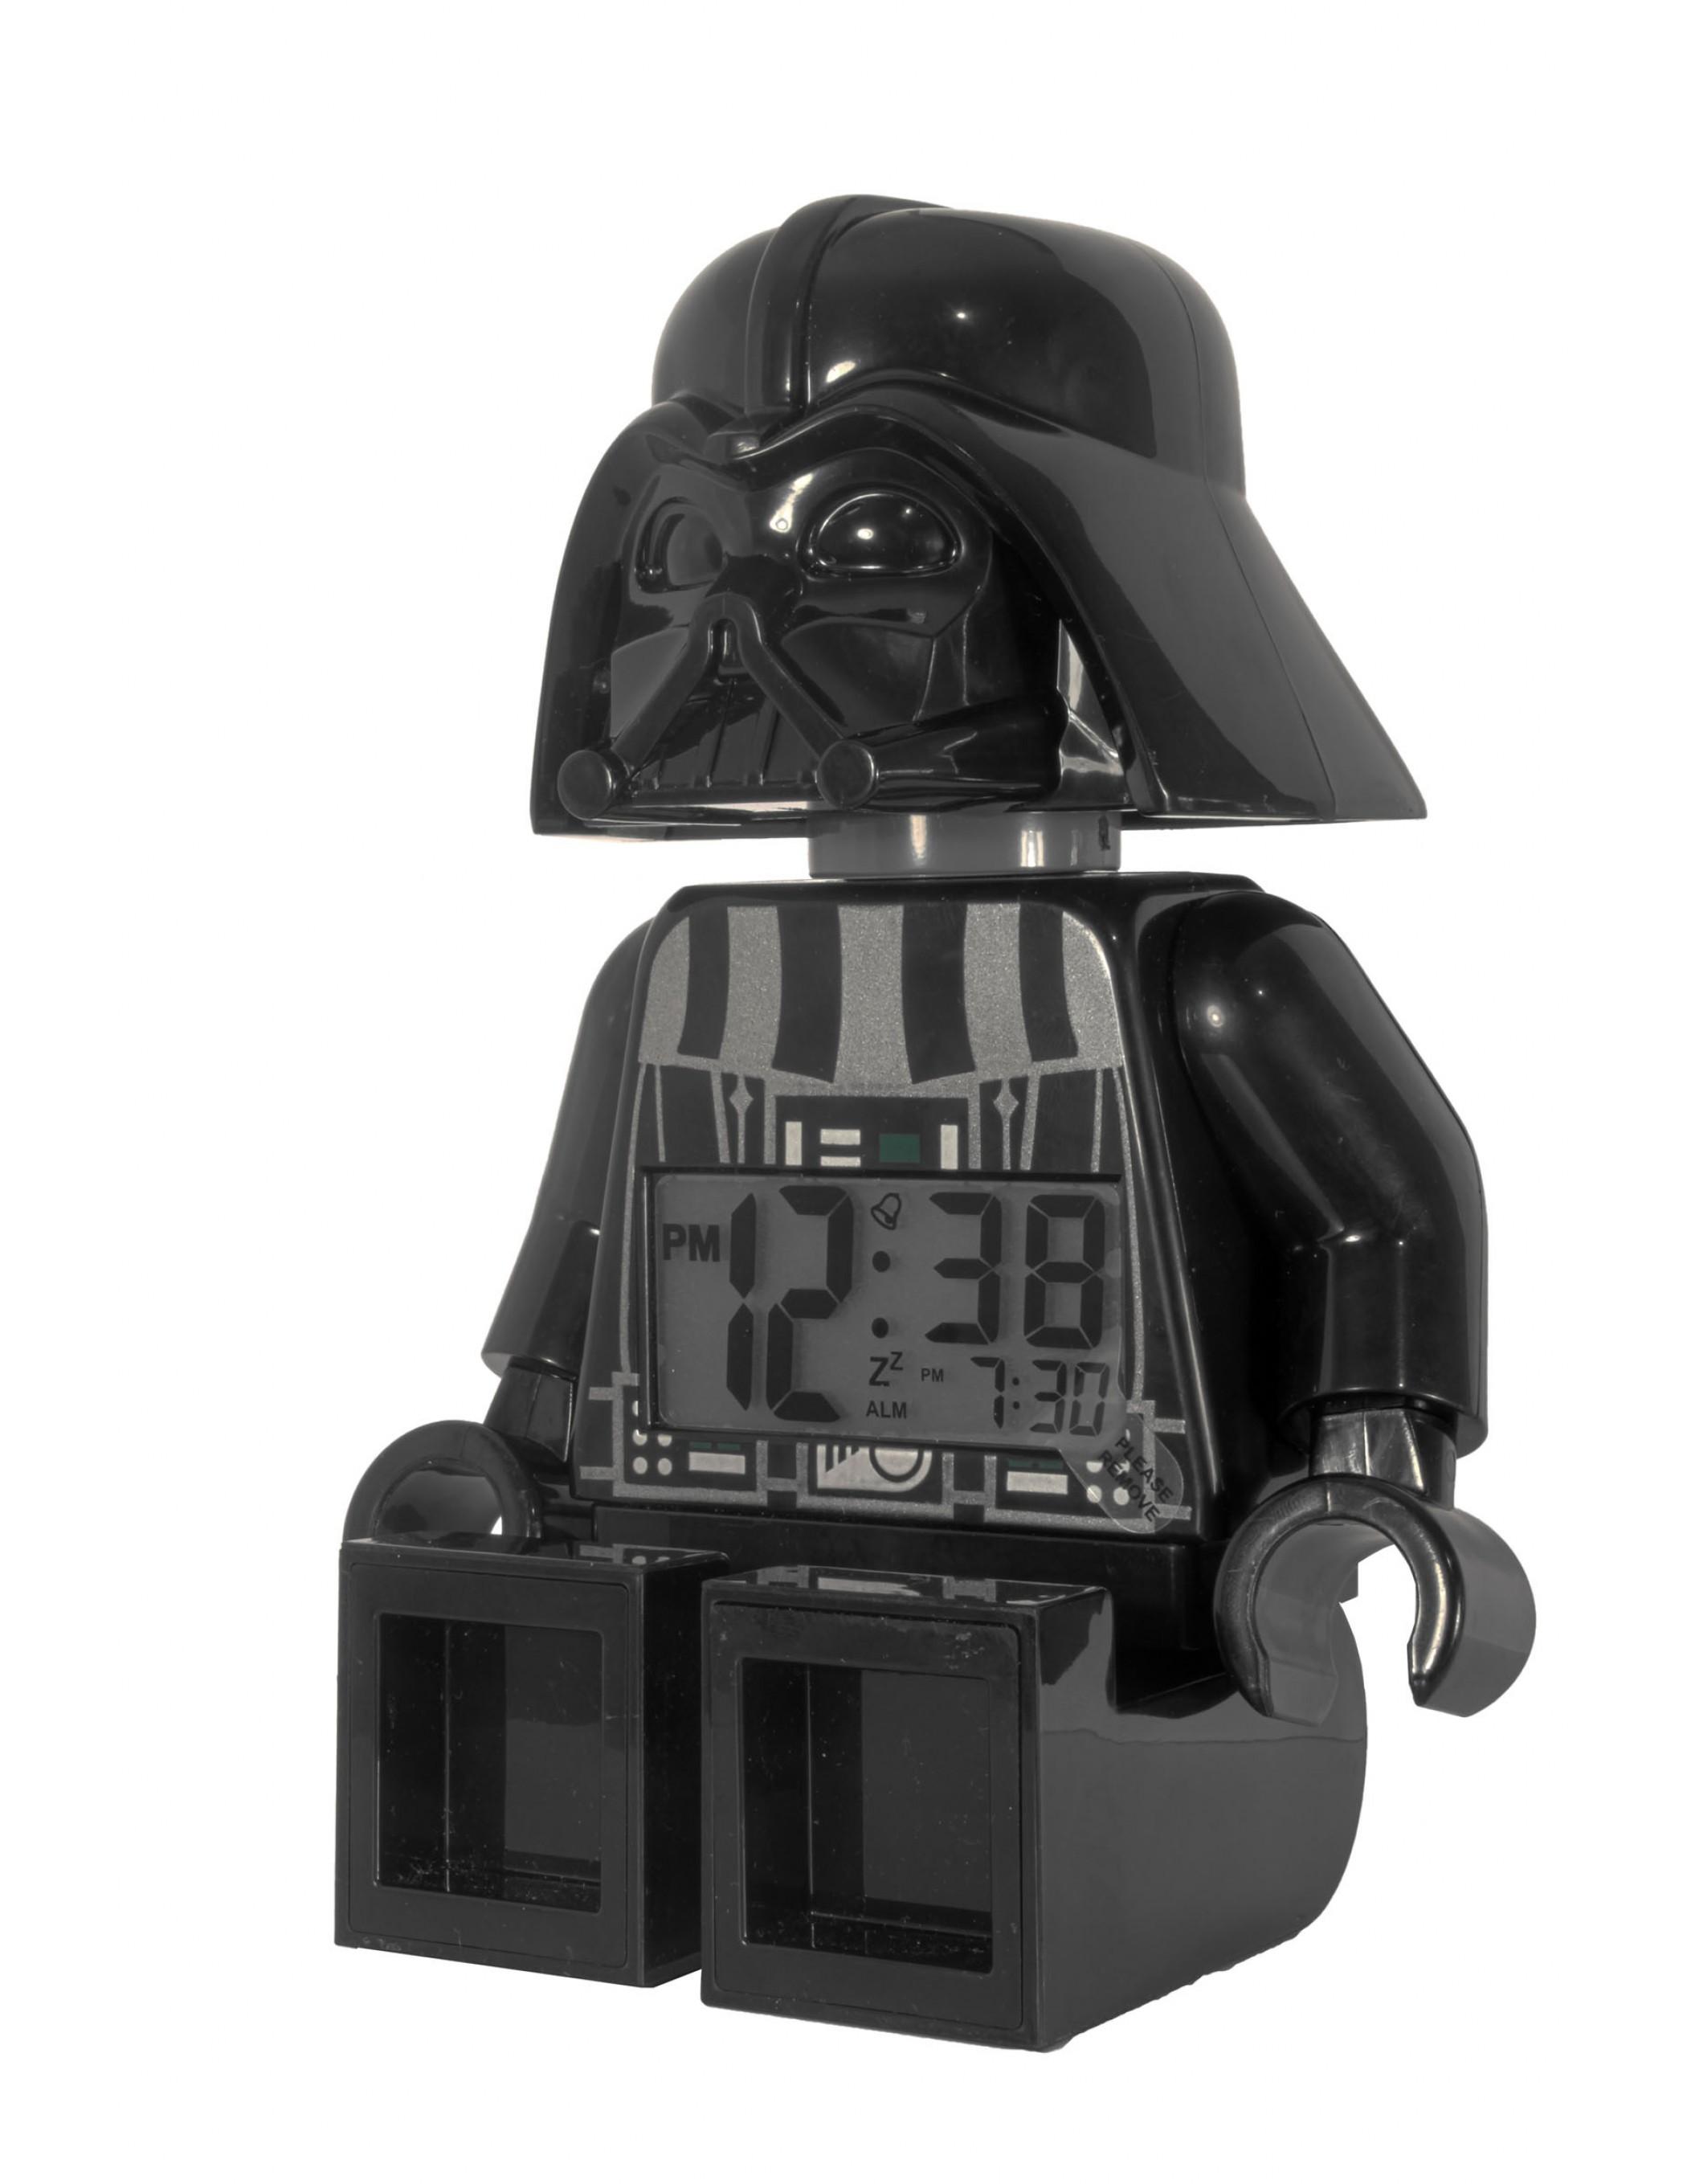 lego wars darth vader minifigure clock best